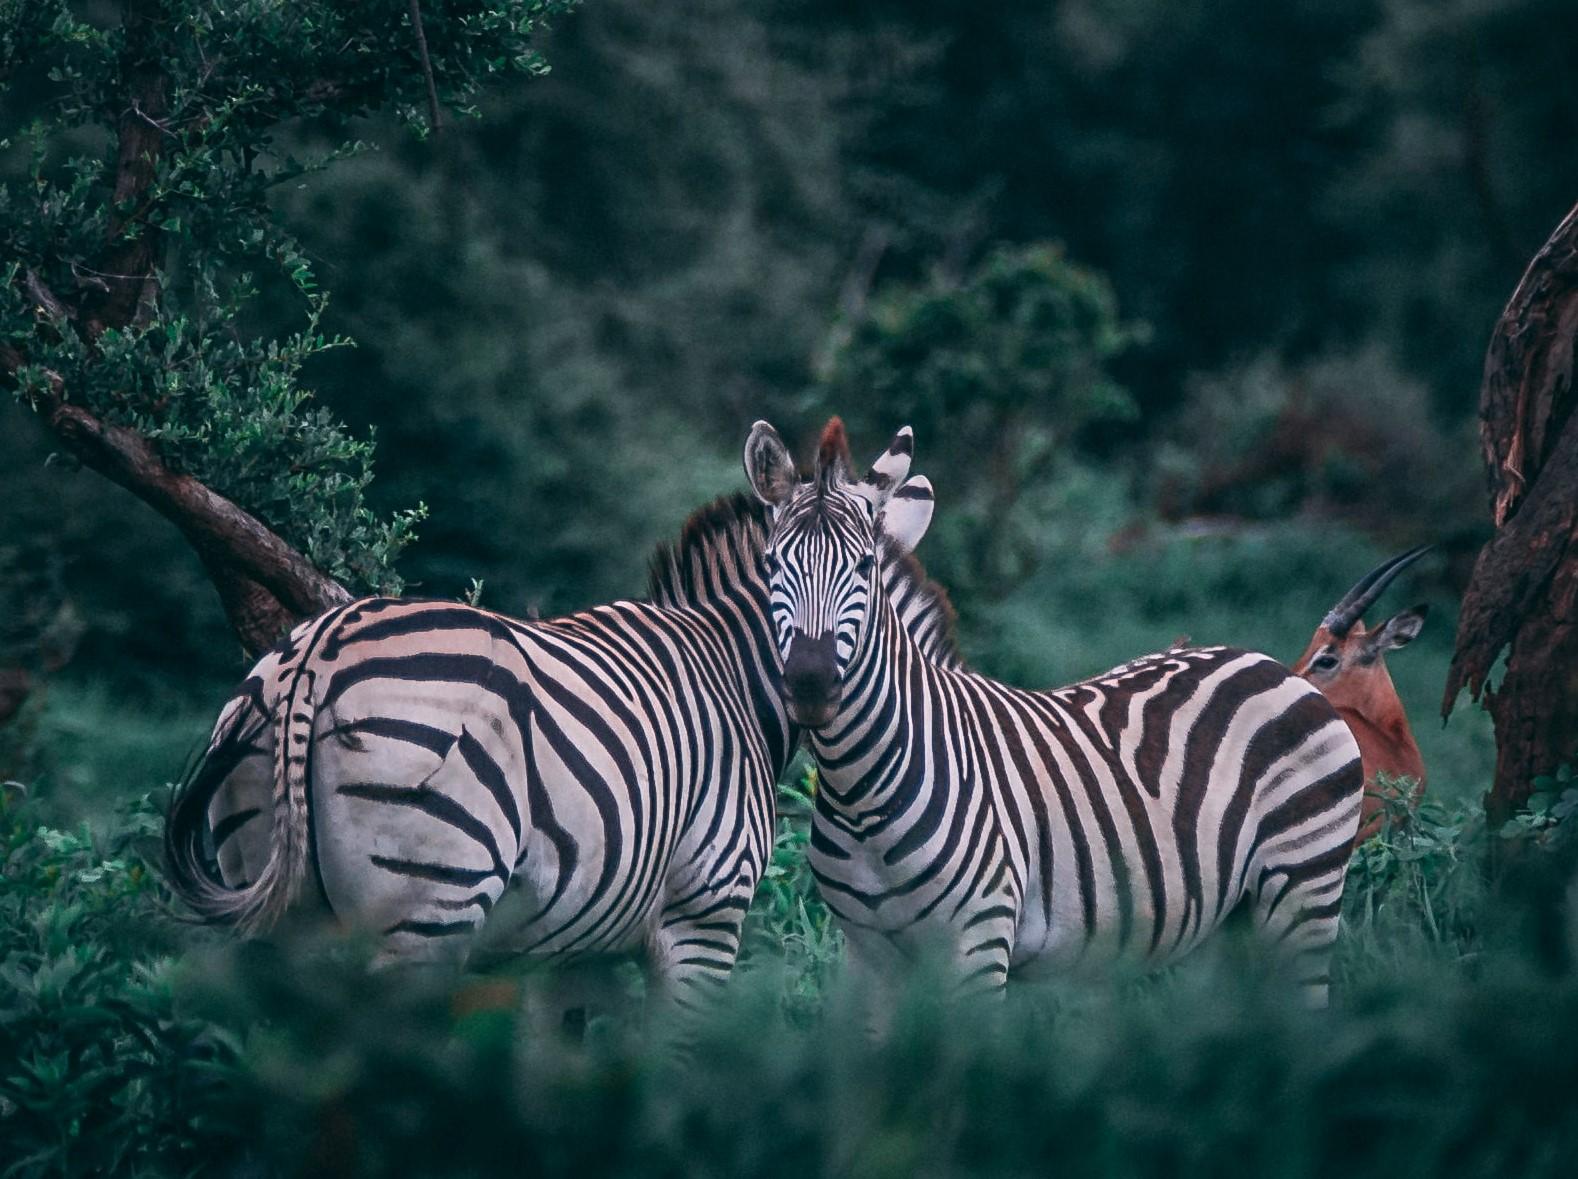 animal eating behavior